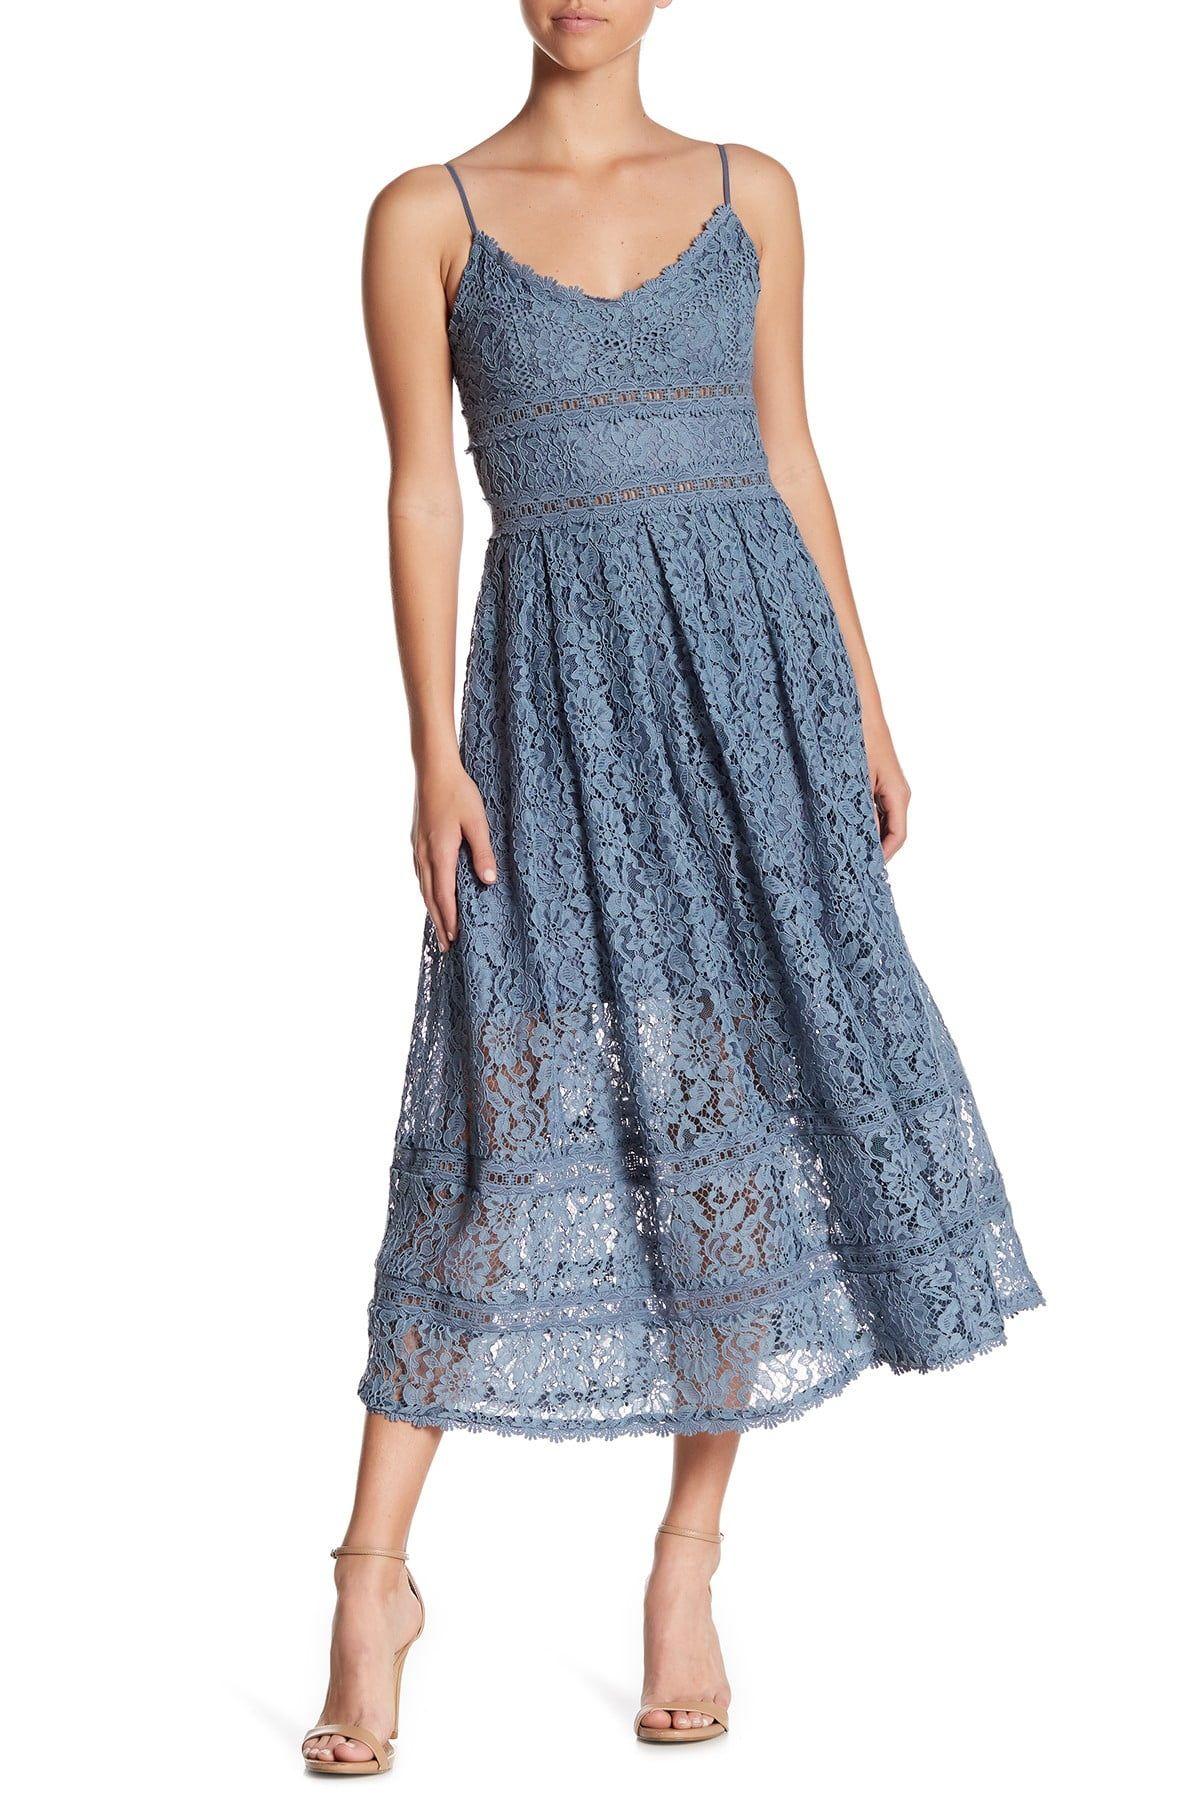 Nsr Sleeveless Lace Midi Dress Nordstrom Rack Lace Midi Dress Lace Summer Dresses Nordstrom Dresses [ 1800 x 1200 Pixel ]